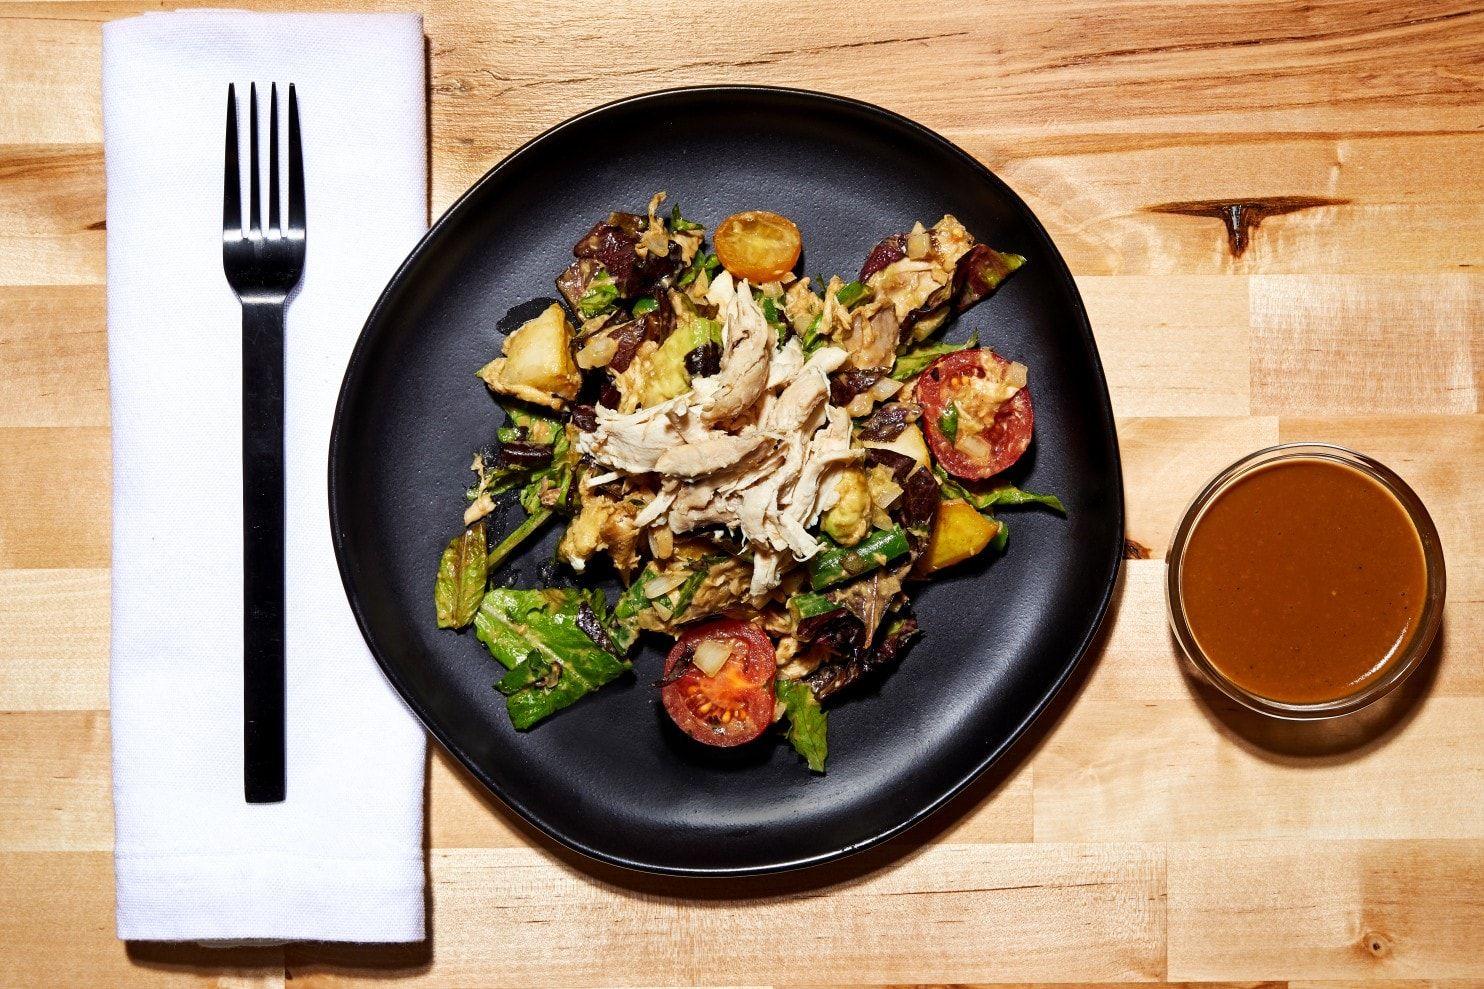 Freds Chopped Chicken Salad Recipe Chopped Salad Vegetable Recipes Salad Recipes